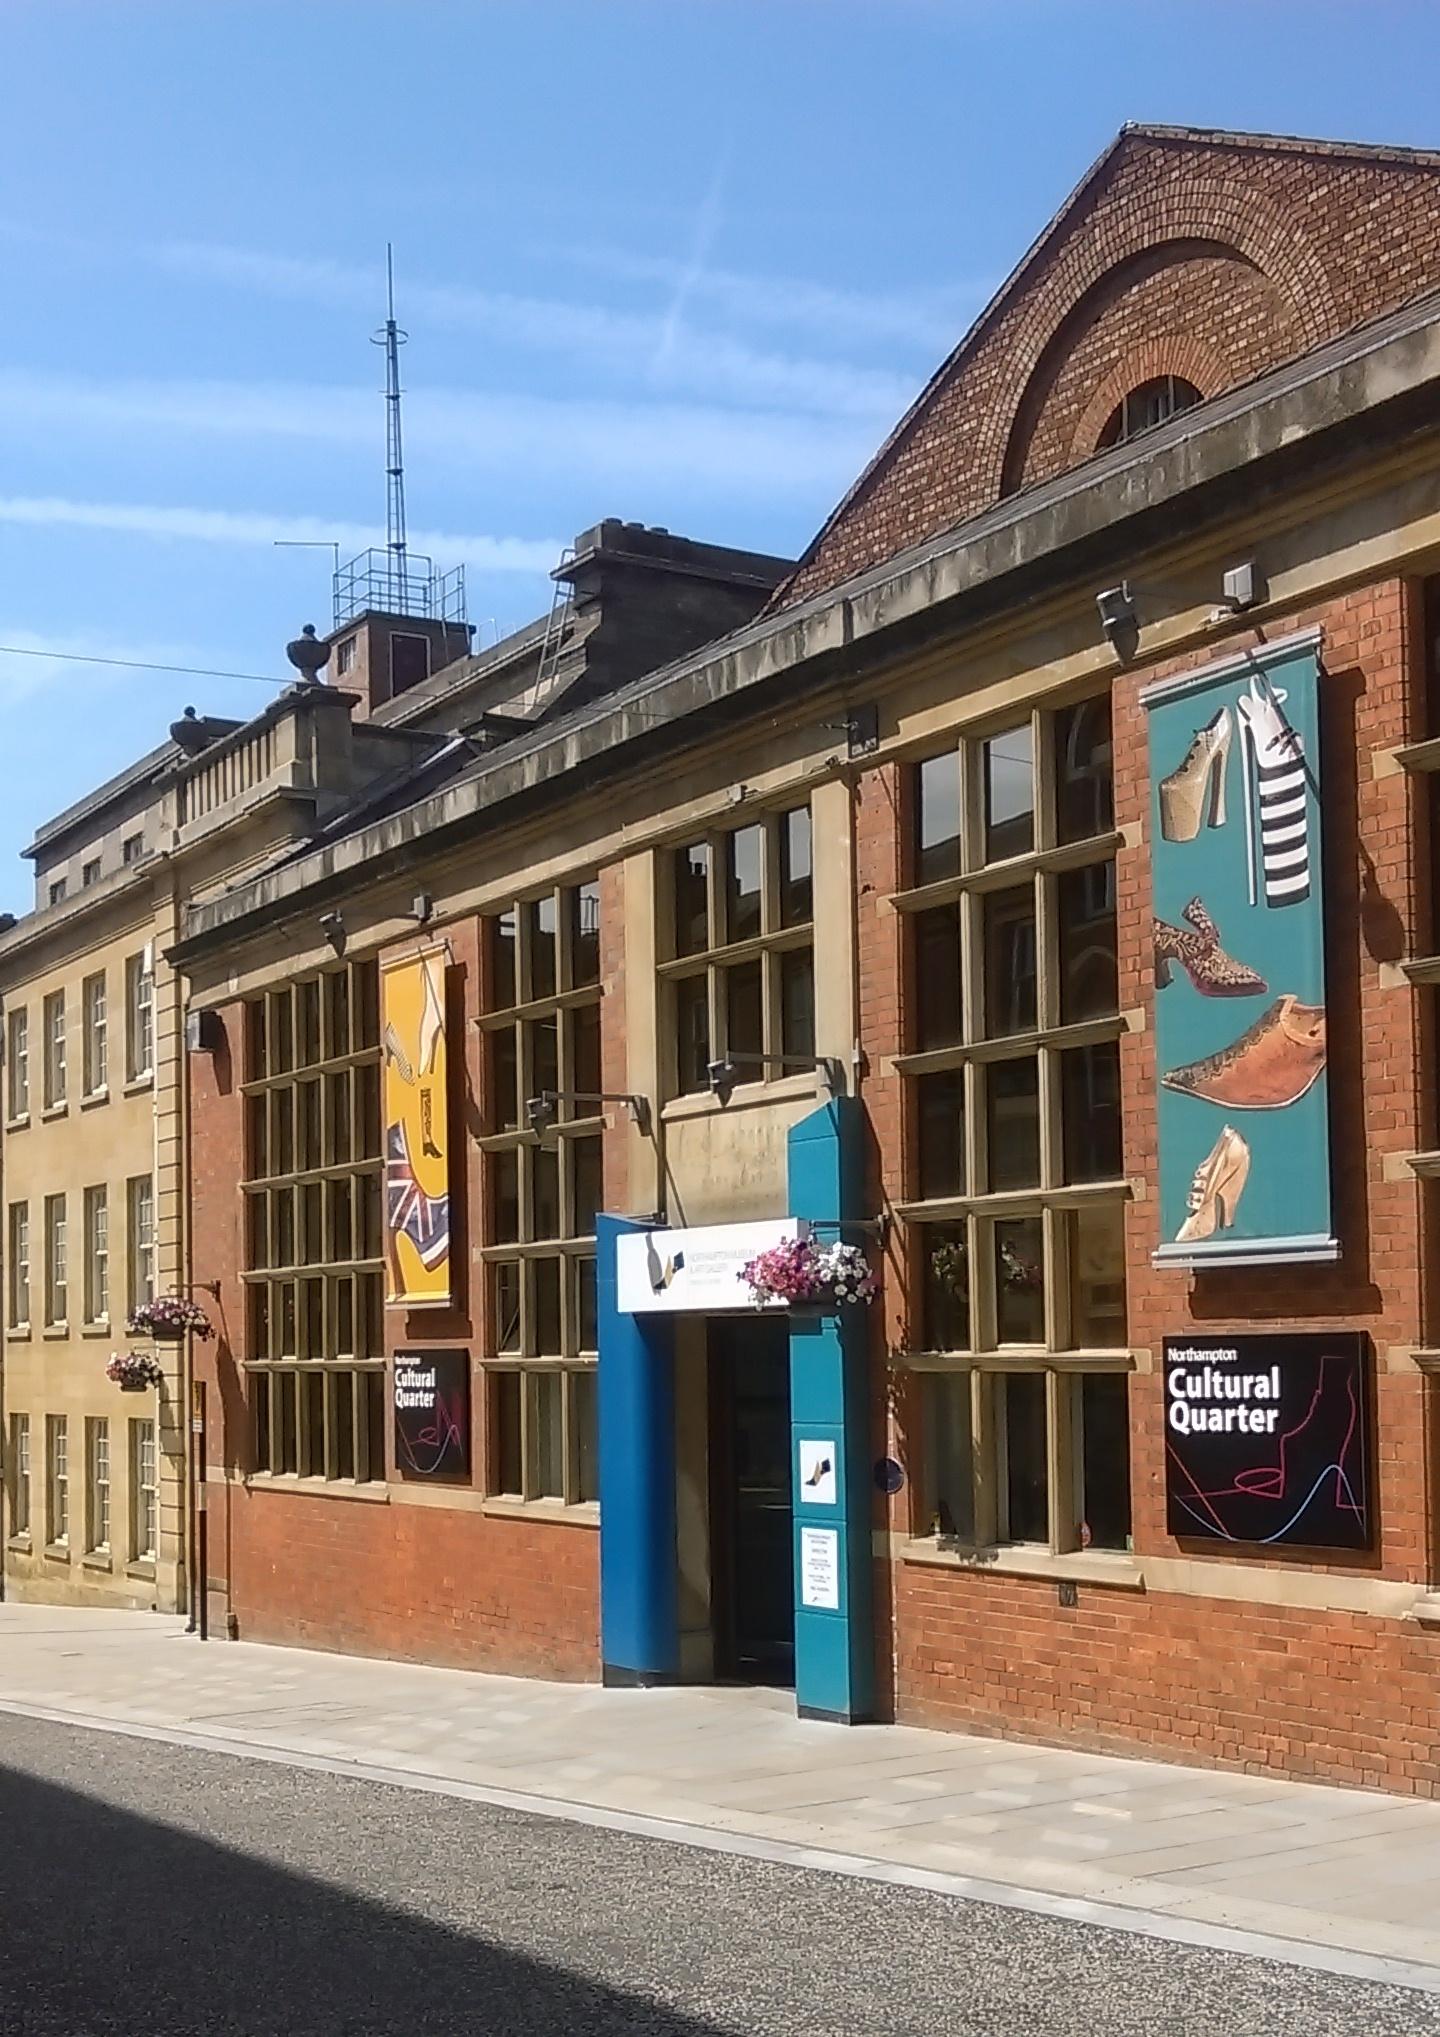 northampton museum and art gallery - wikiwand